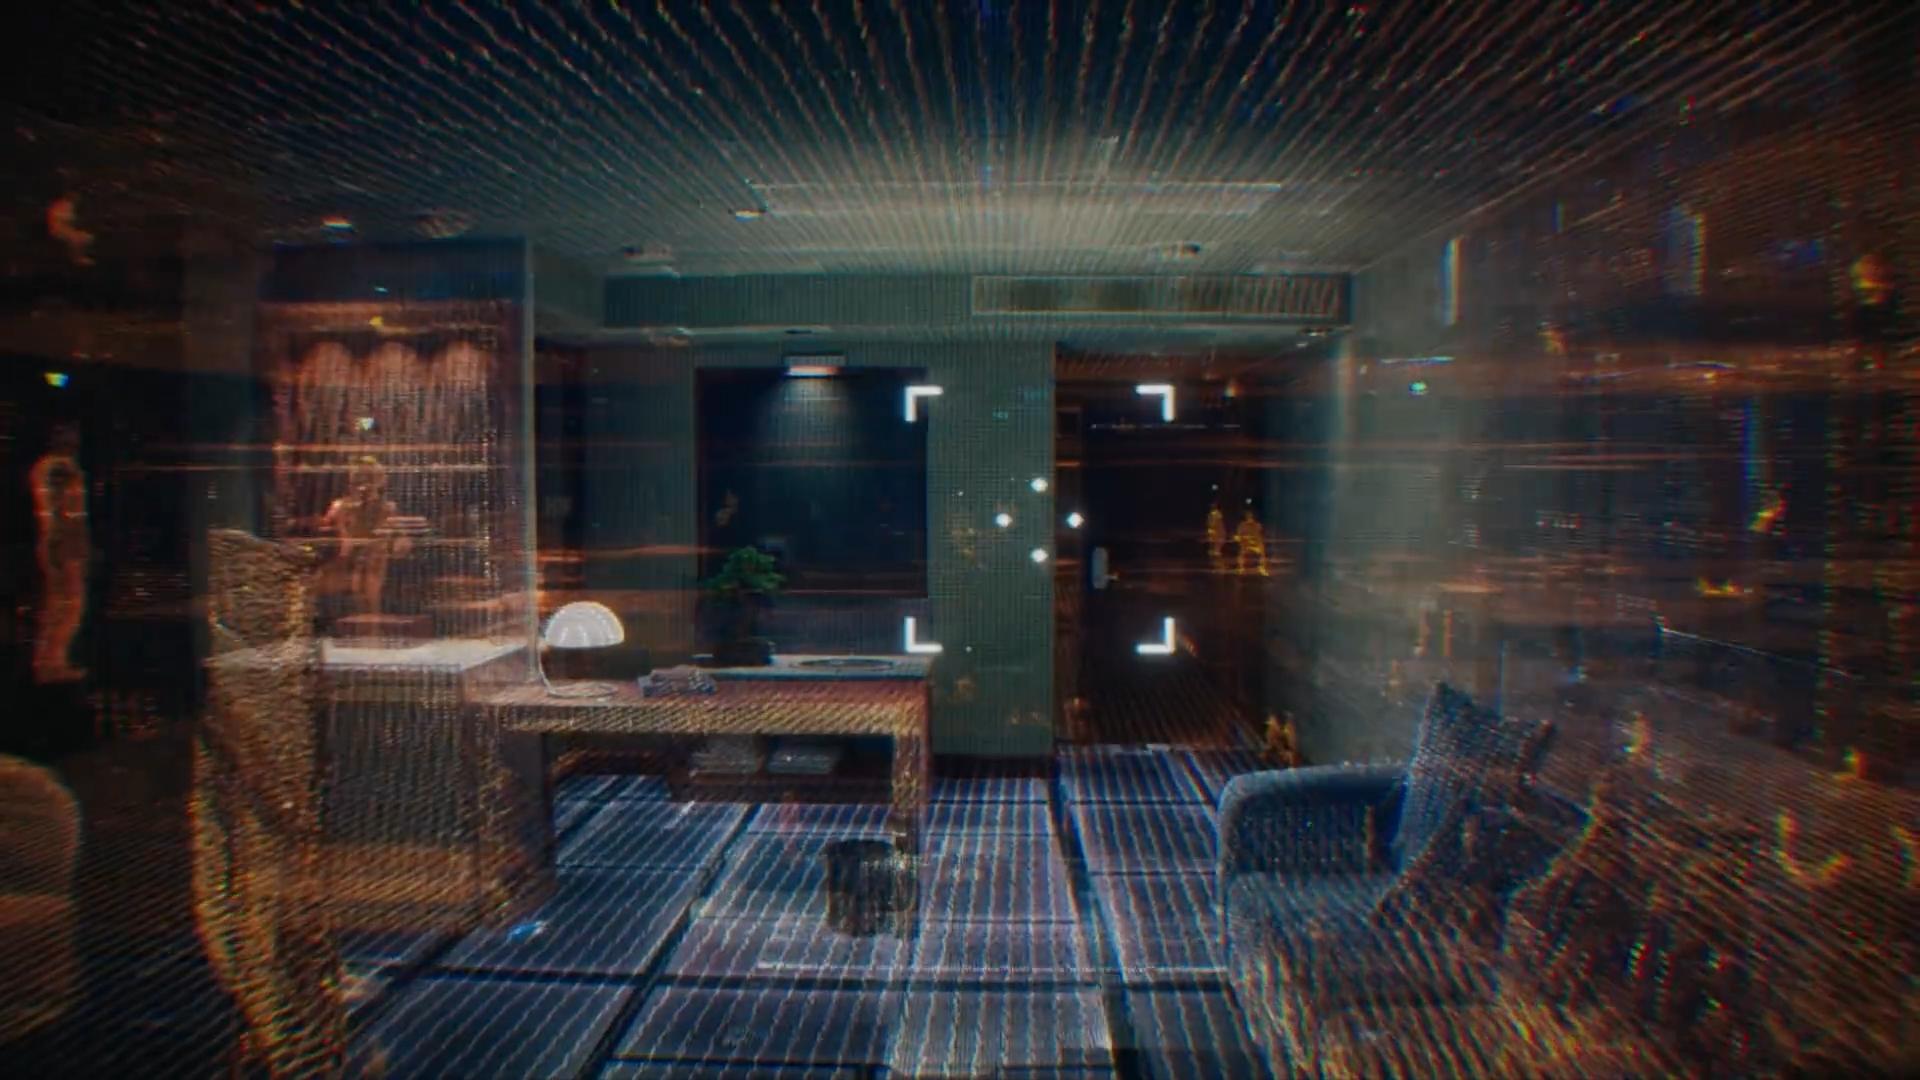 HotelVision_03.jpg